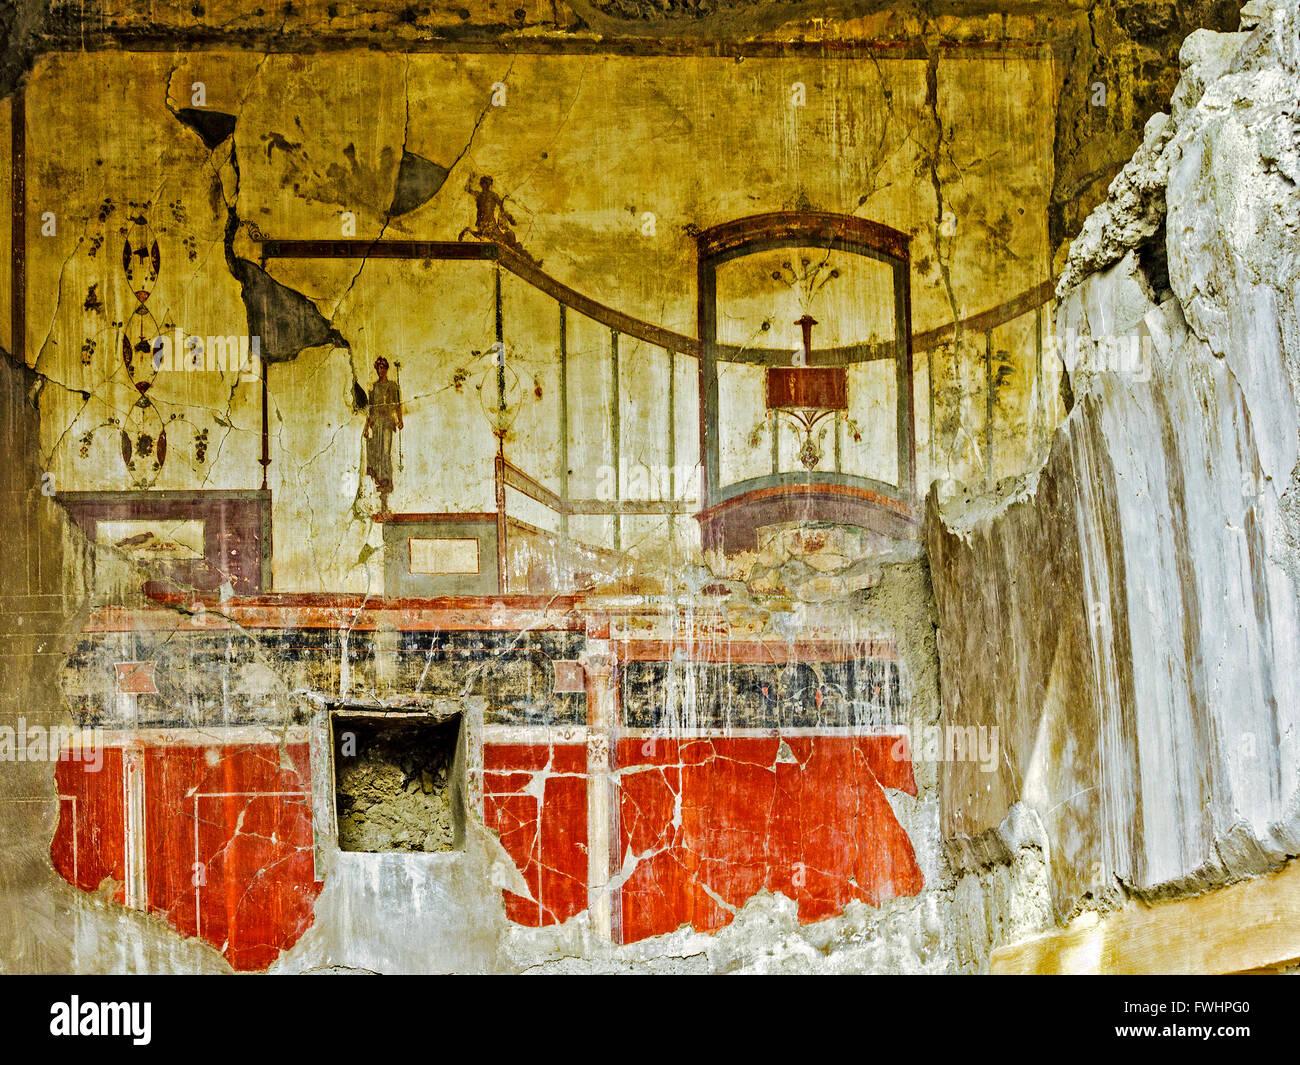 Wall painting Herculaneum Italy Stock Photo: 101809120 - Alamy